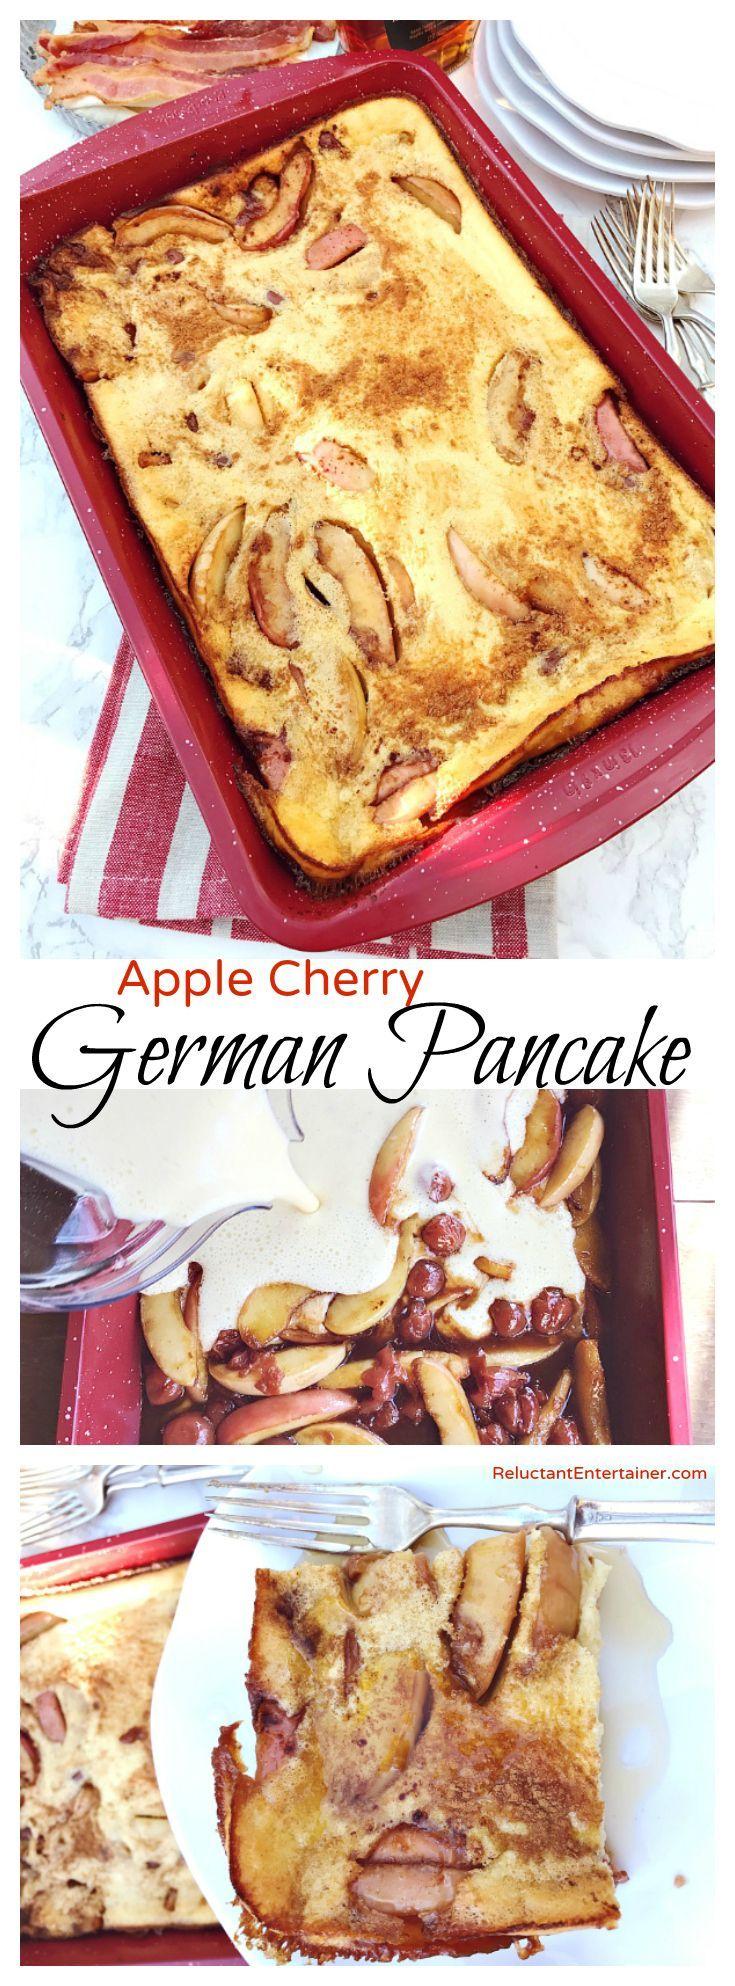 Apple Cherry German Pancake Recipe